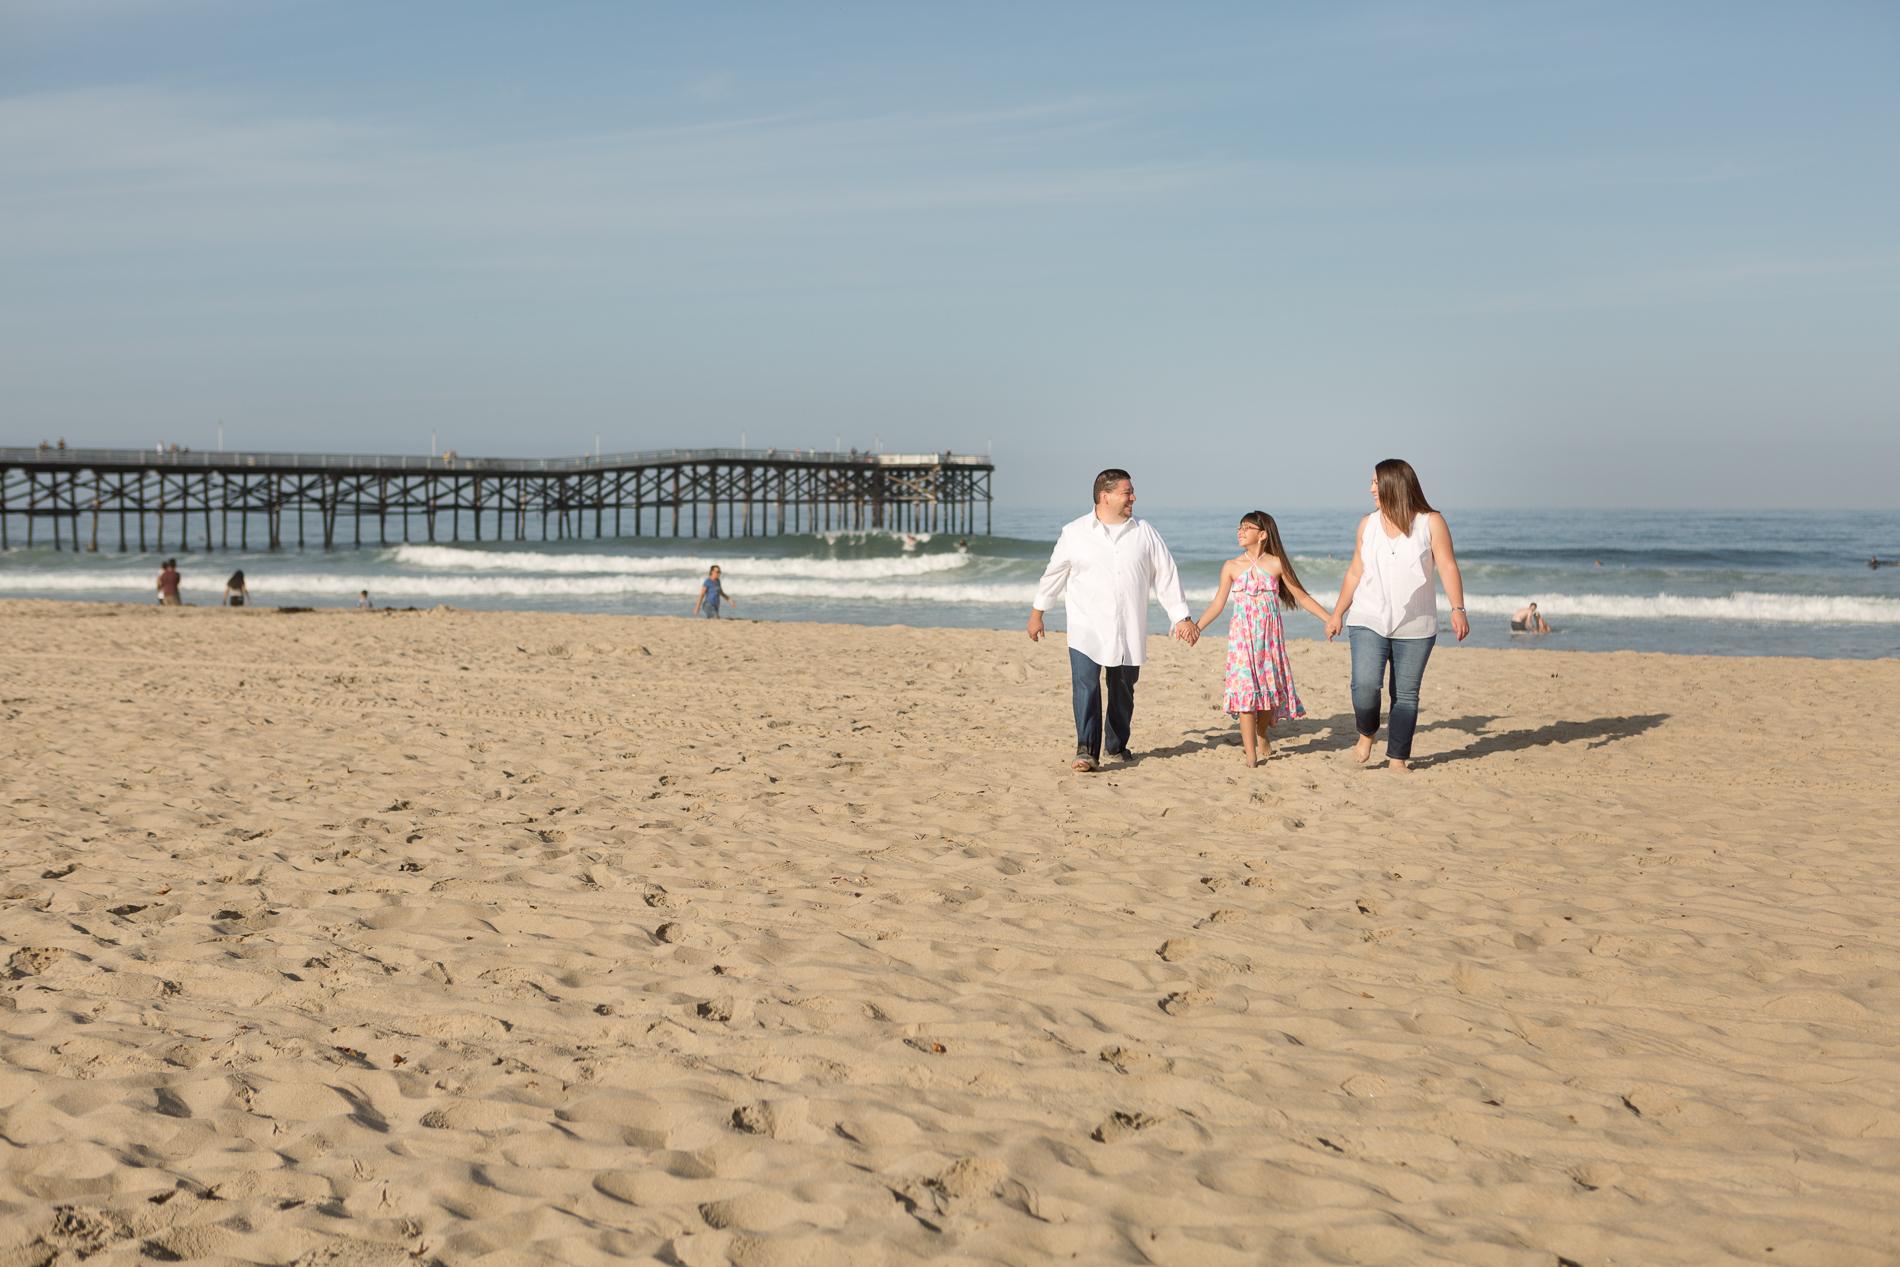 San.Diego.Family.Vacation.Photographer.Christine.Dammann.Photography.GFWS-3.jpg